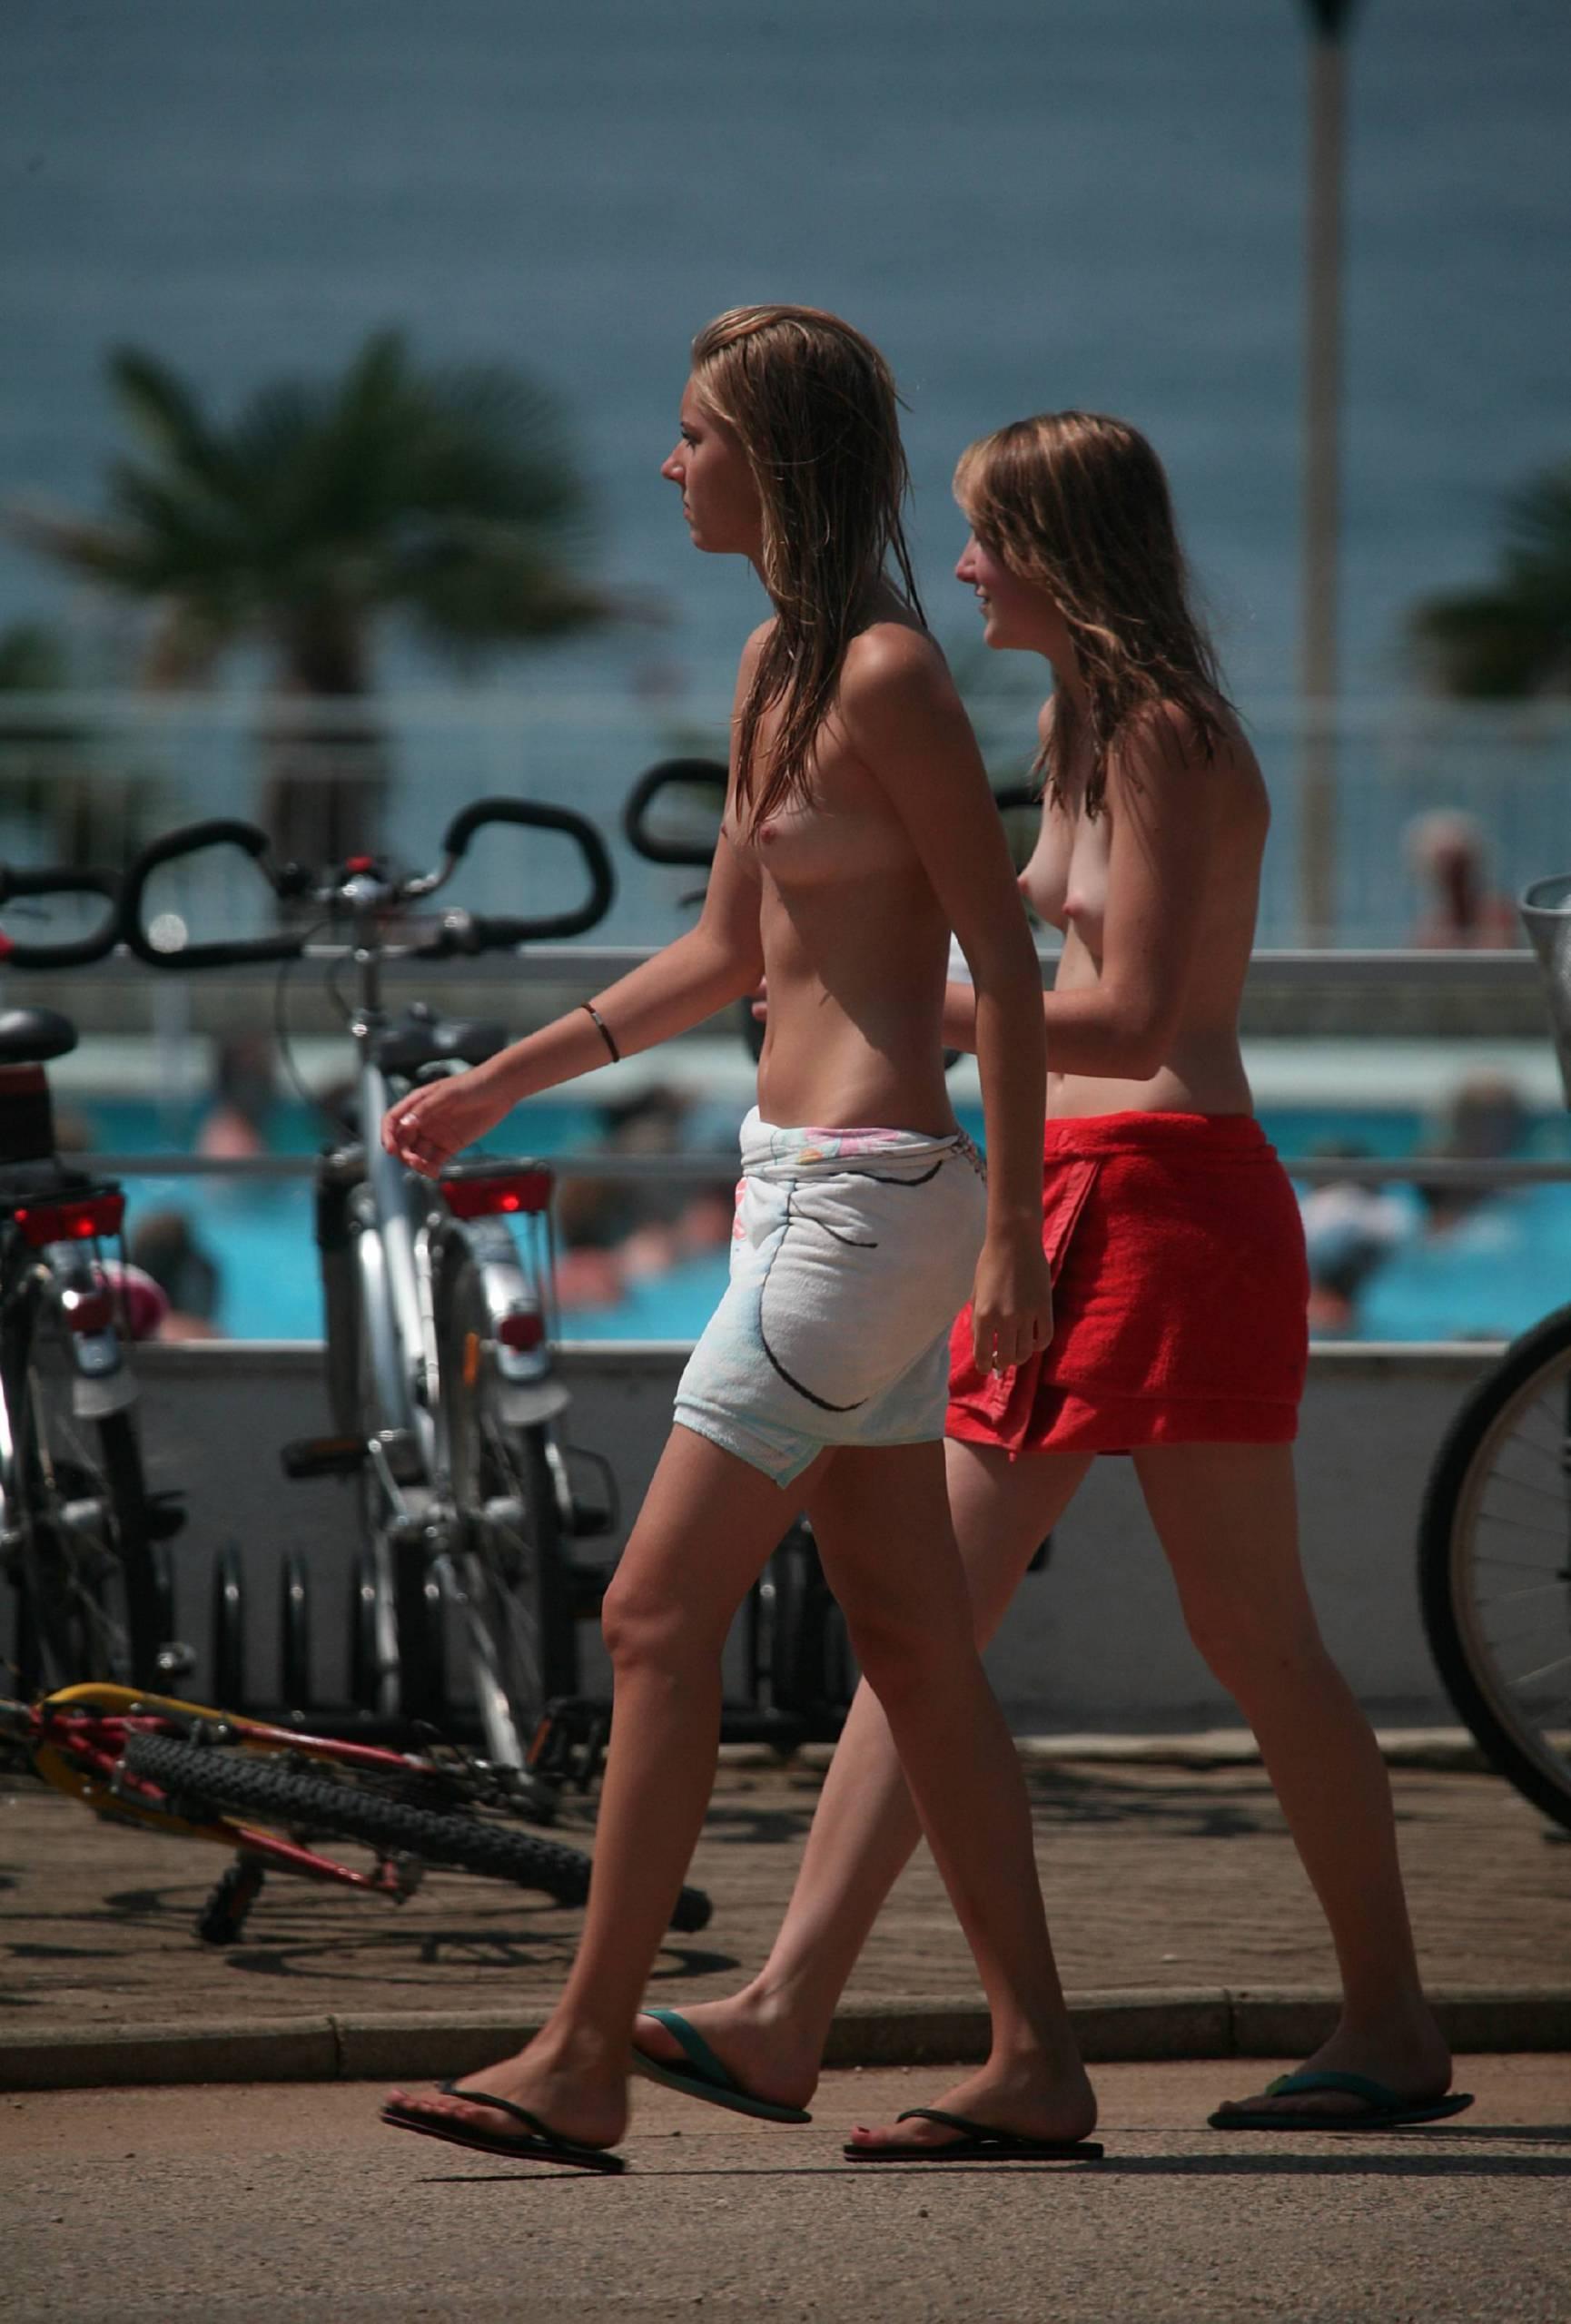 Ladies Biking Near Park - 1